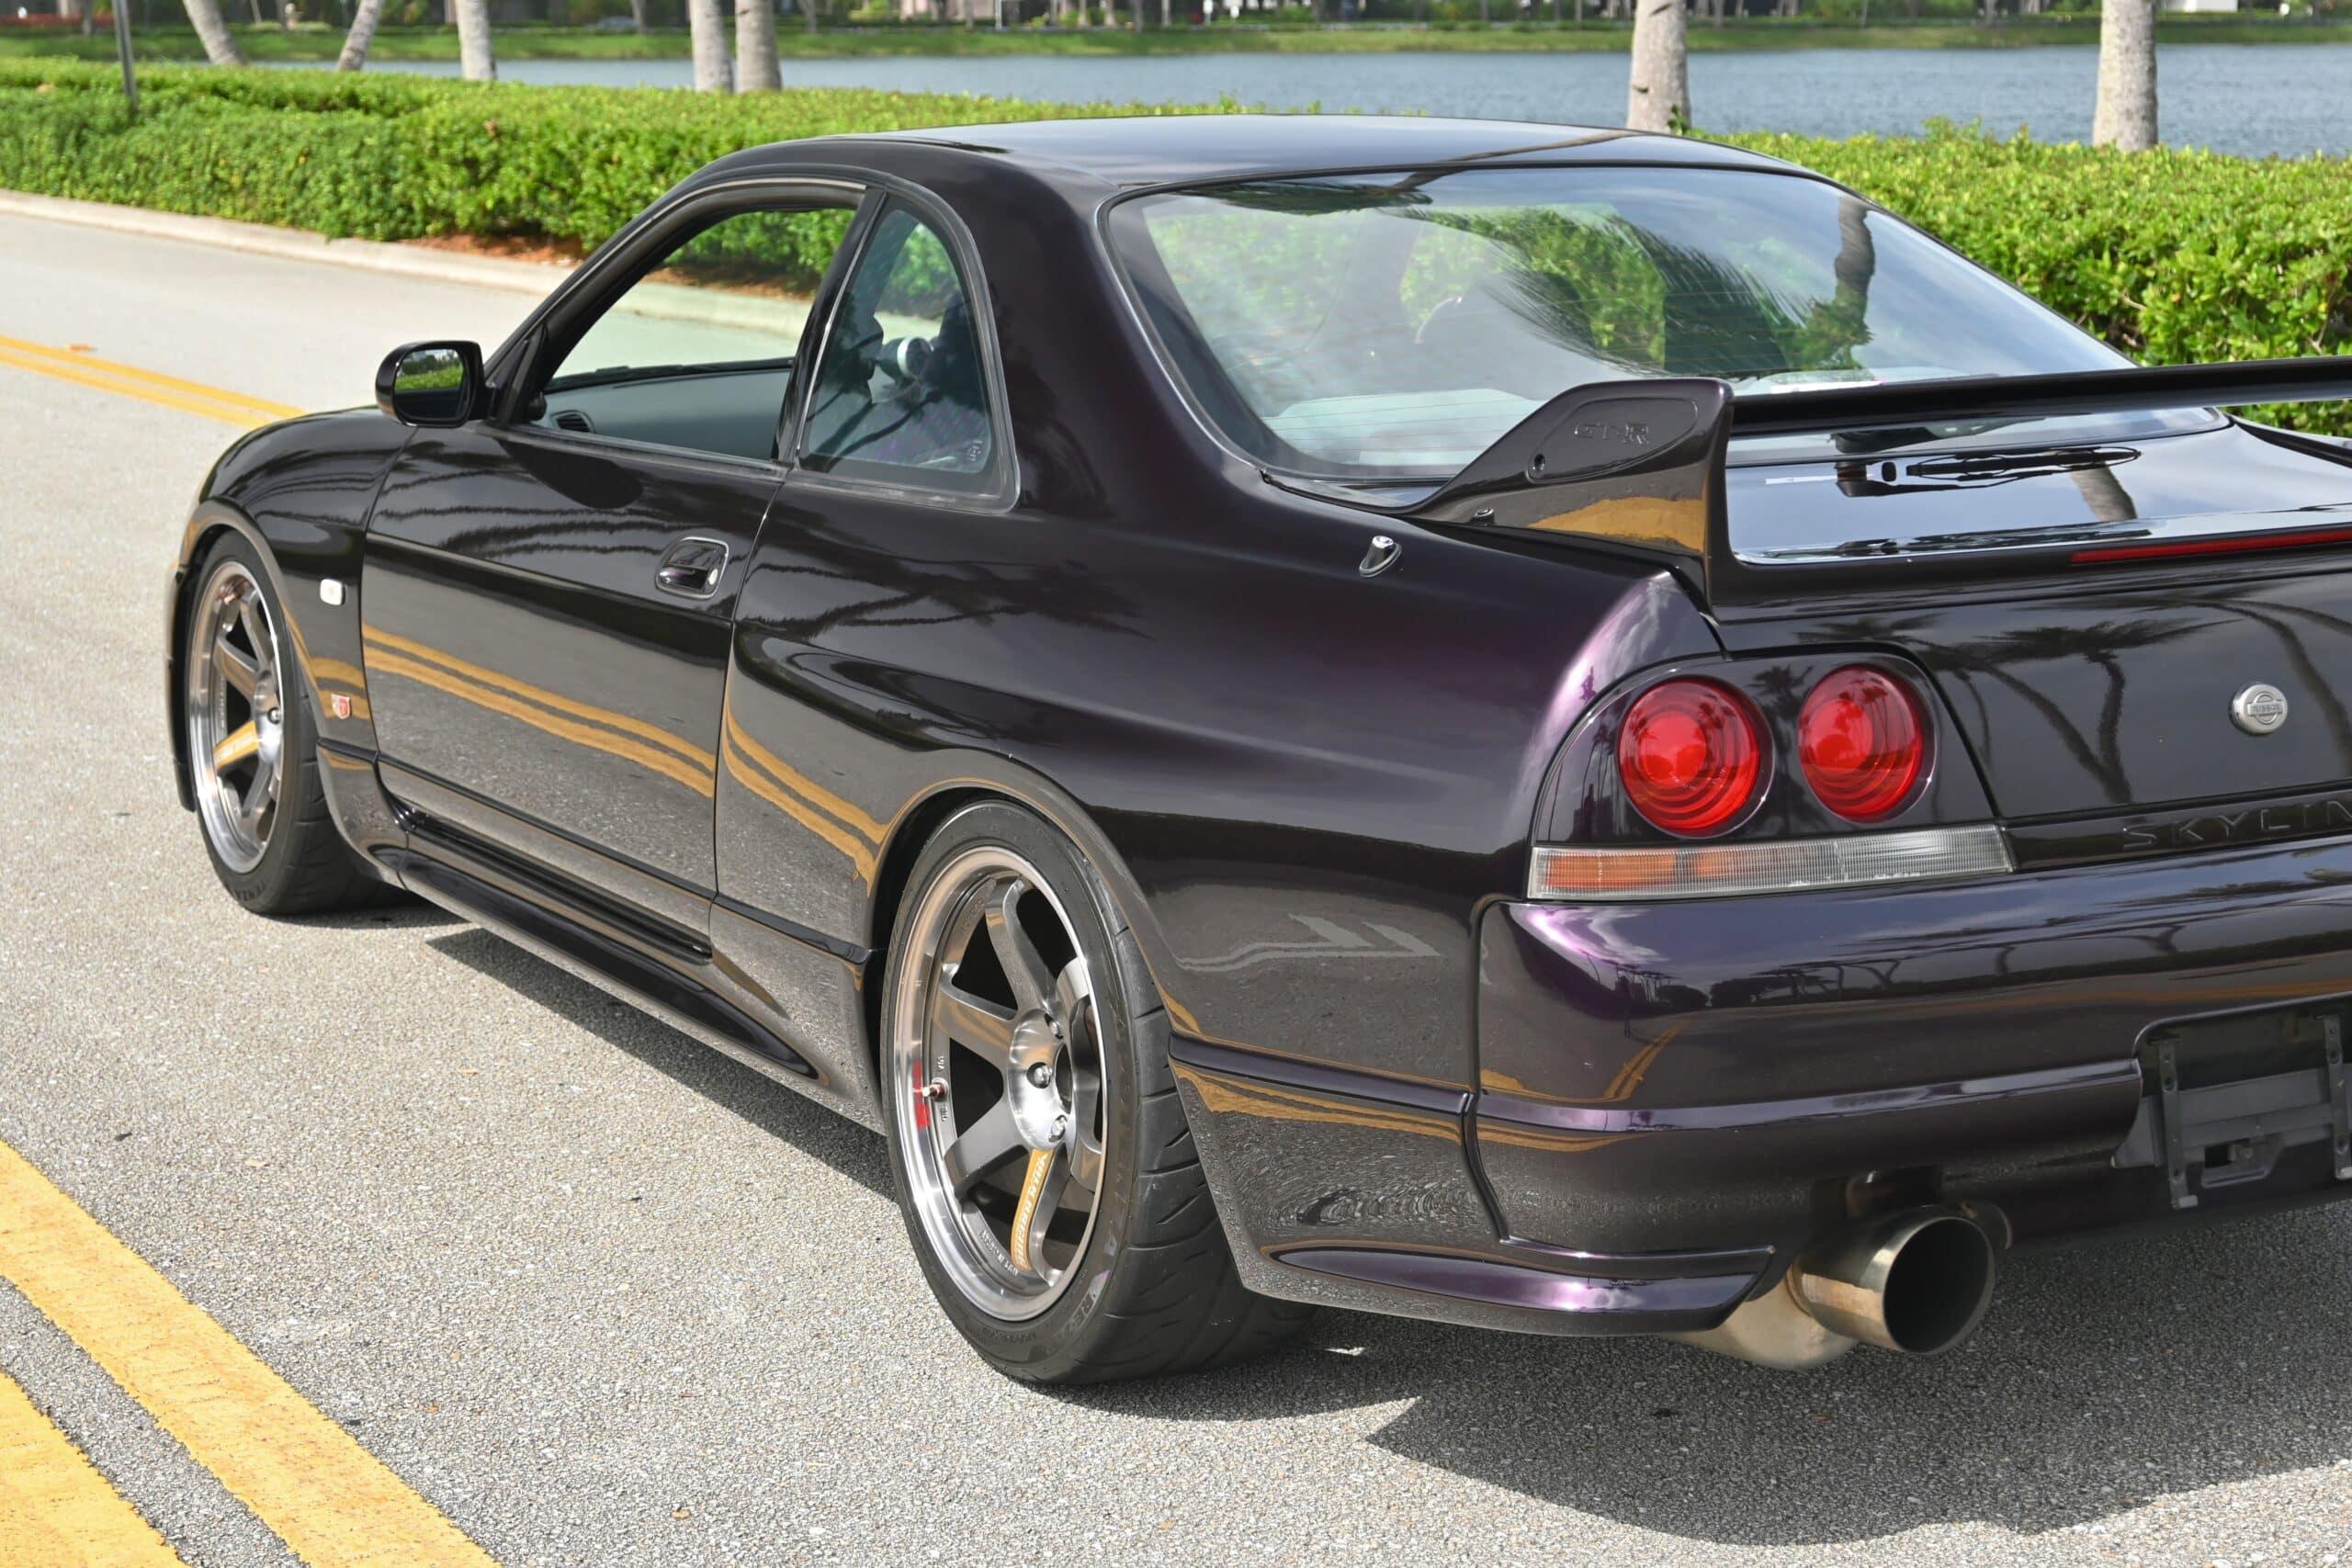 1996 Nissan GT-R R33 Skyline Midnight Purple T88 Single Turbo – HKS supporting mods – R34 GTR Bucket Seats